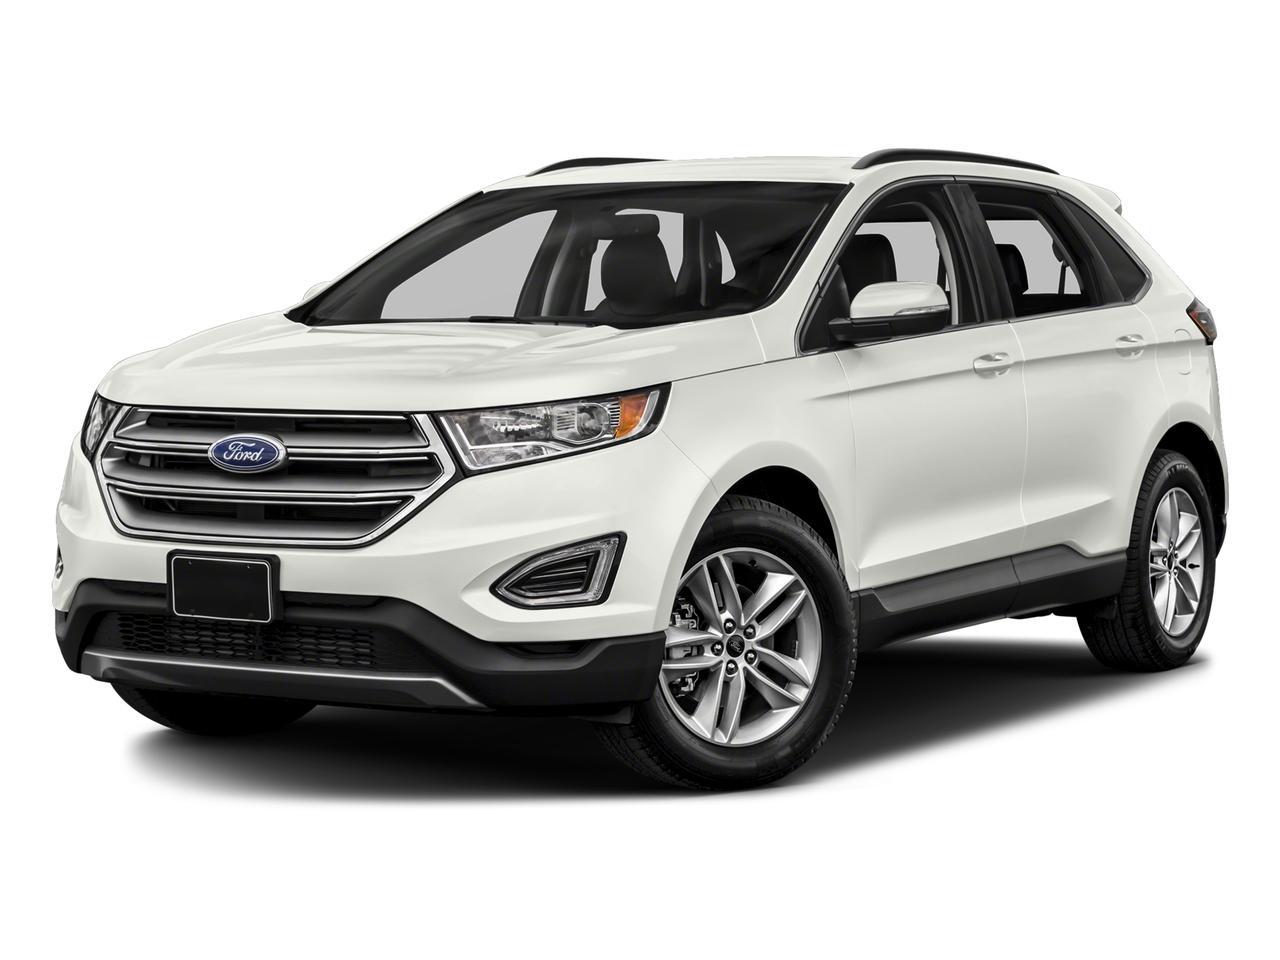 2018 Ford Edge Vehicle Photo in Peoria, IL 61615